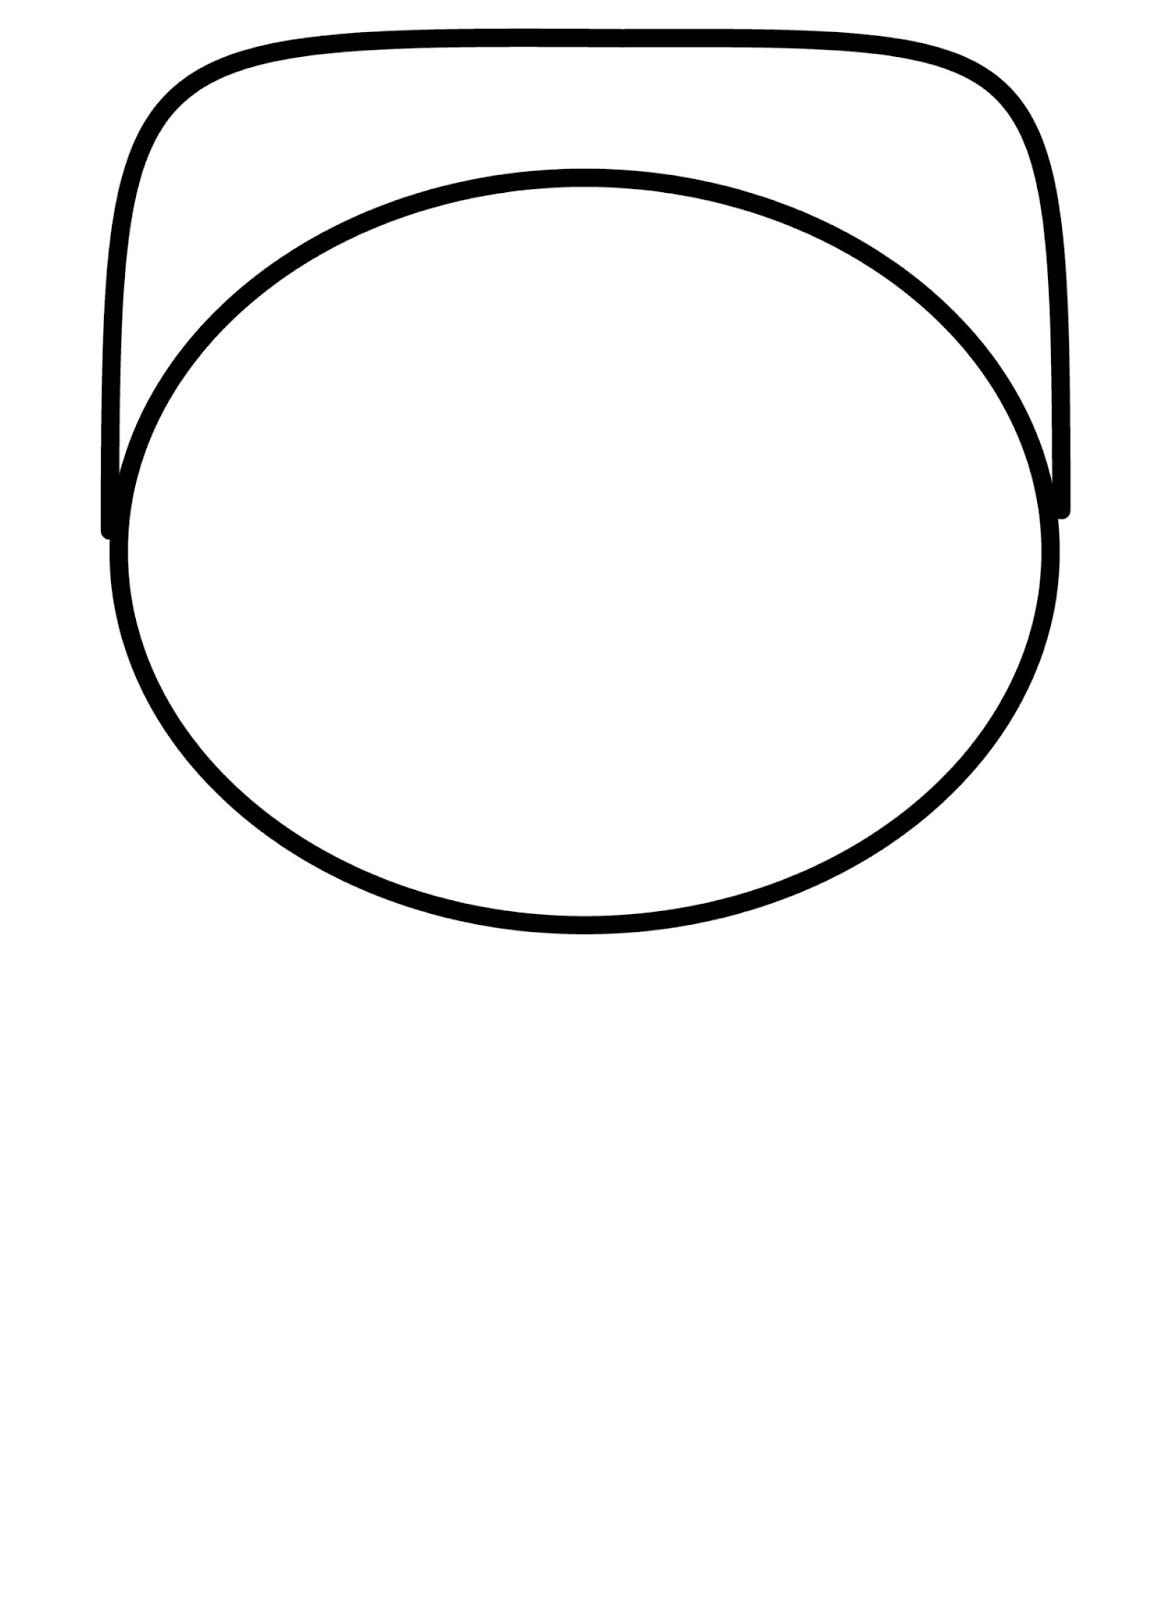 Cute N Kawaii: How To Draw Kawaii Frankenstein